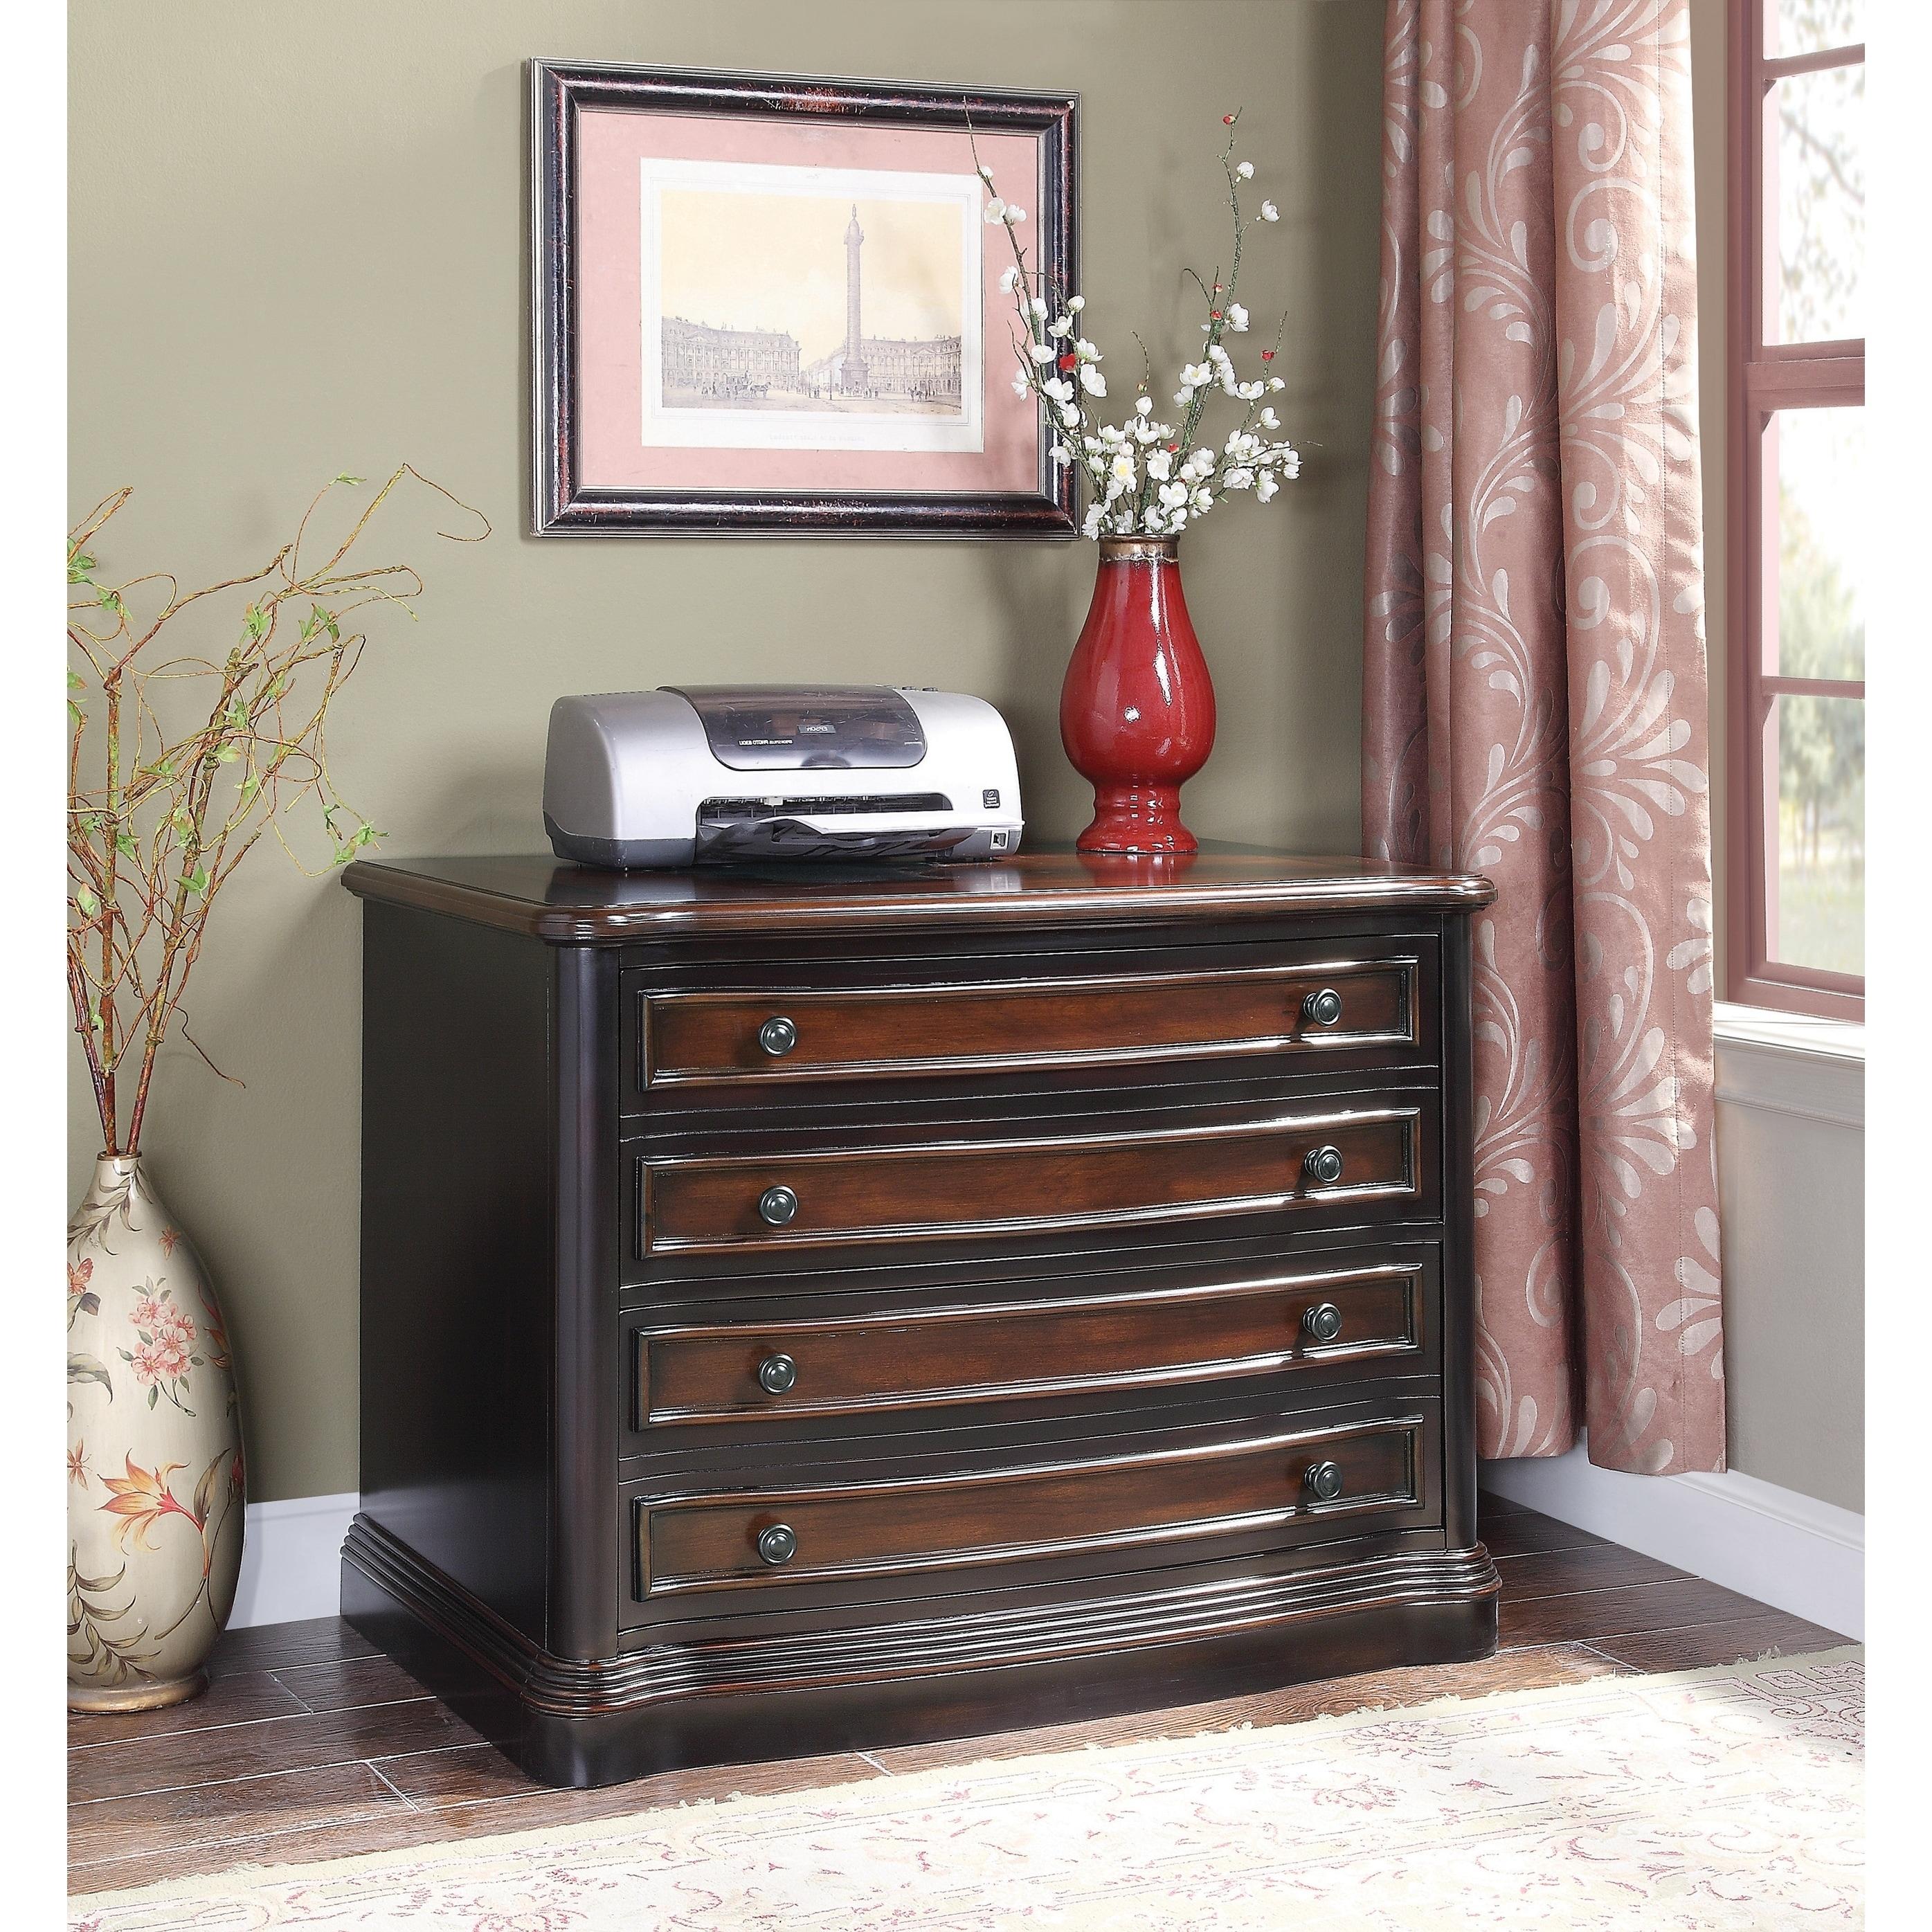 Coaster Furniture Black and Cherry Wide File Cabinet (Bla...